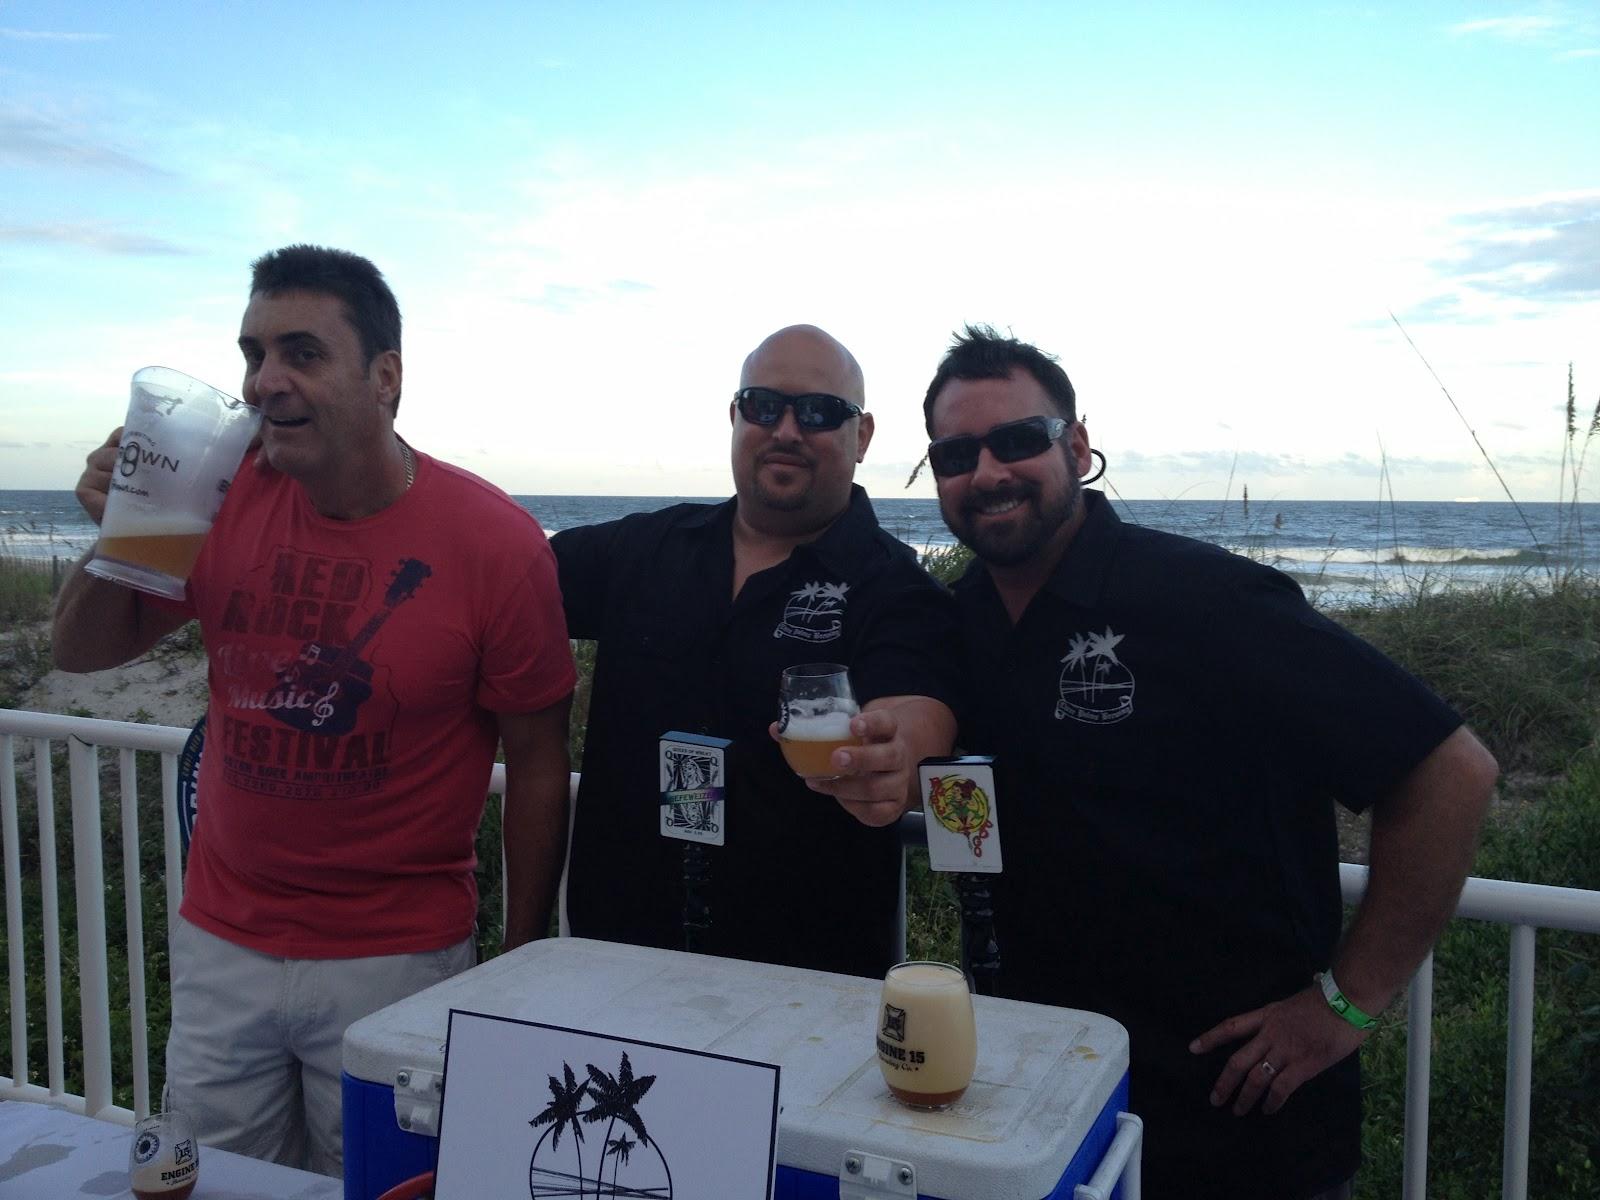 Jax Brew Bitch Beaches Summer Fest For Mda 2012